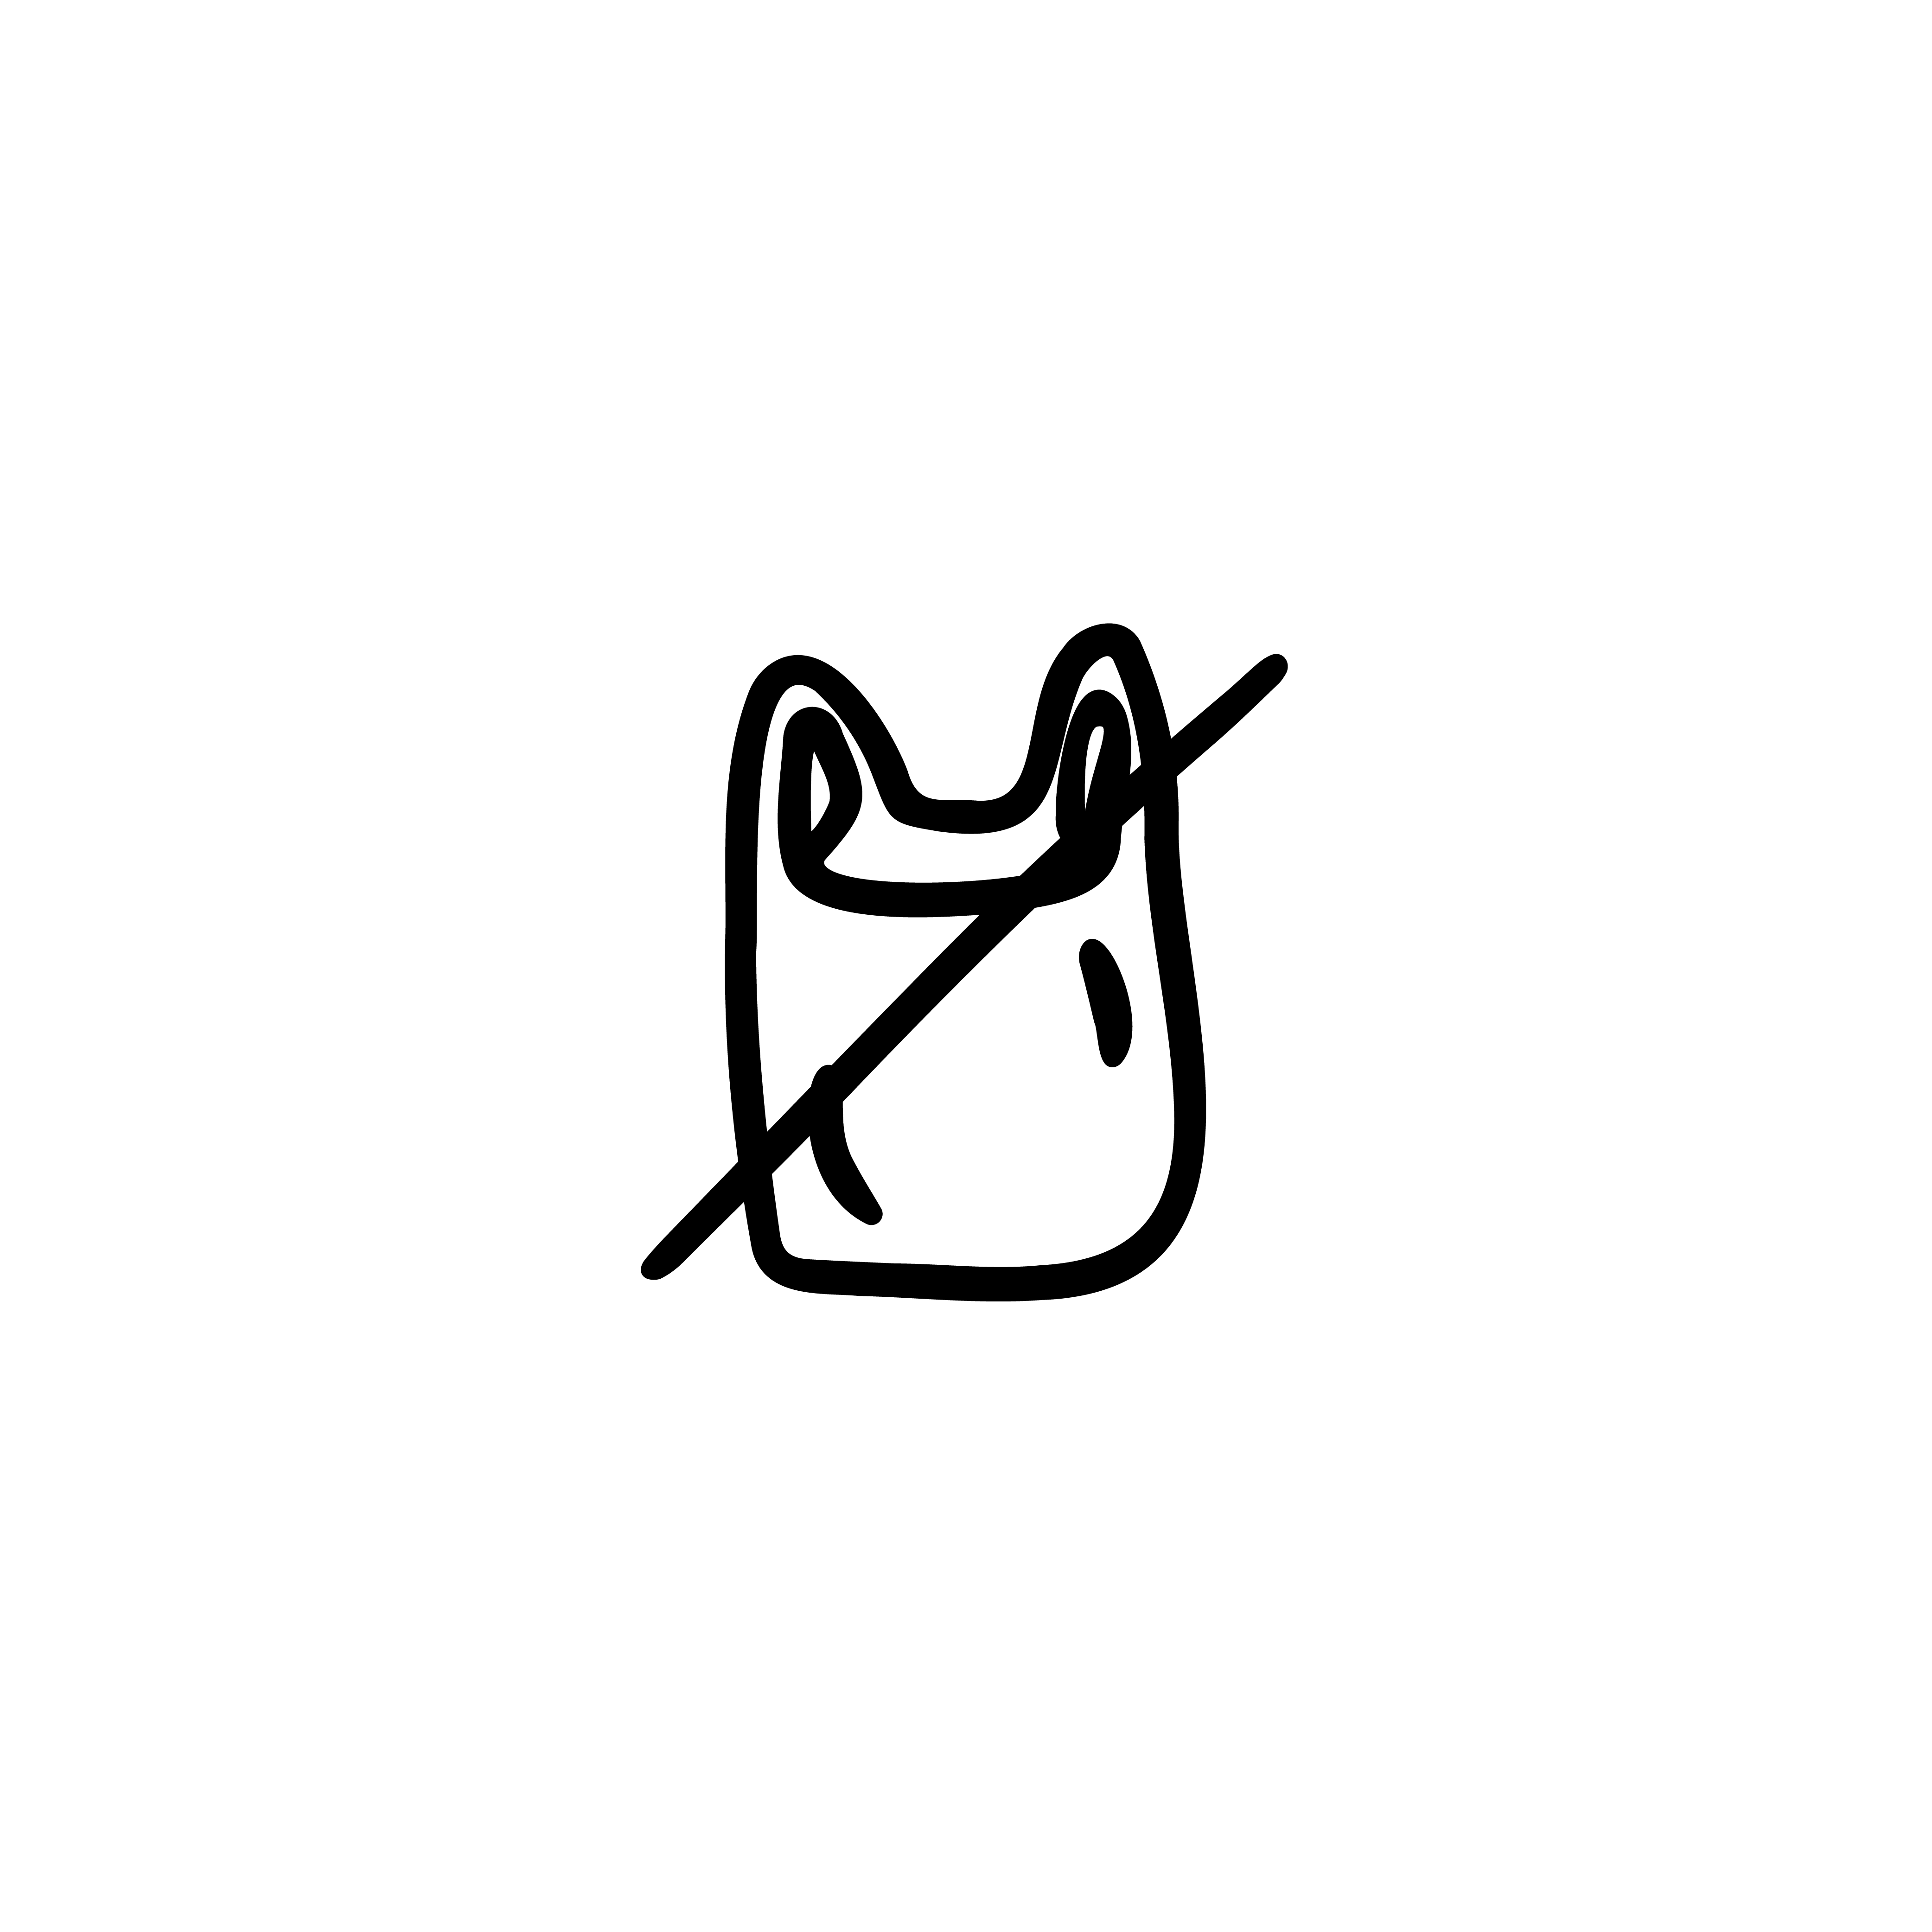 Picto_ZéroPlastique_BaobabLab